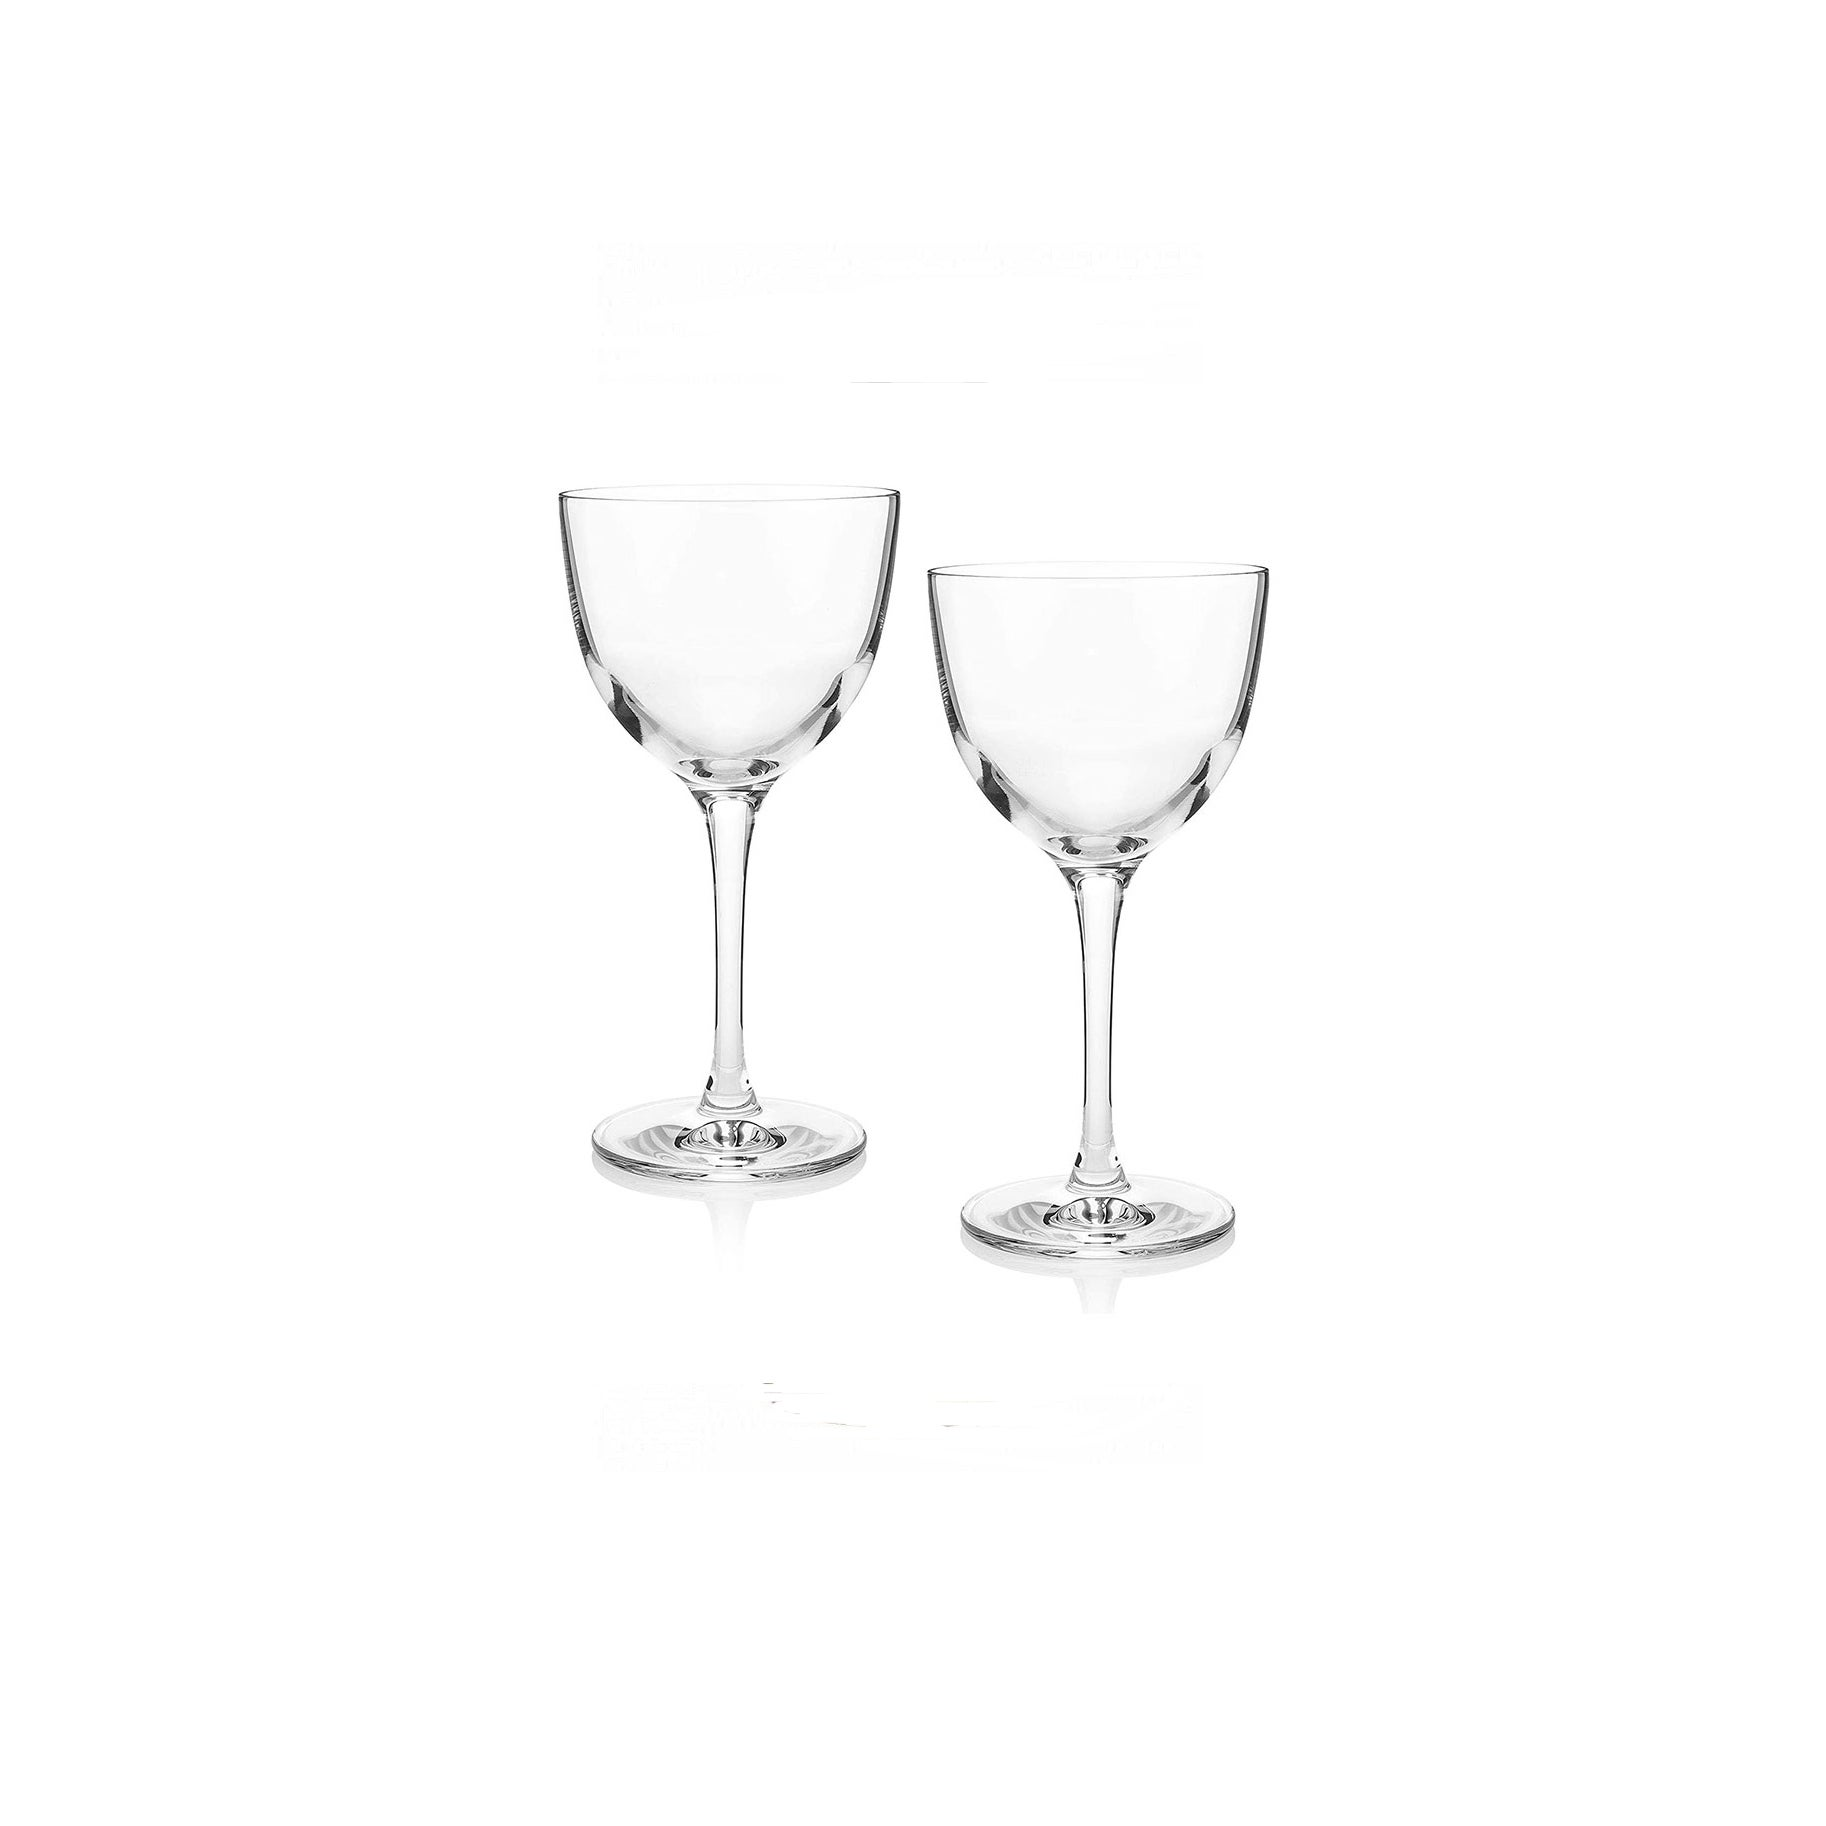 The Best Matini Glass Option: History Company Original Nick and Nora Martini Glasses